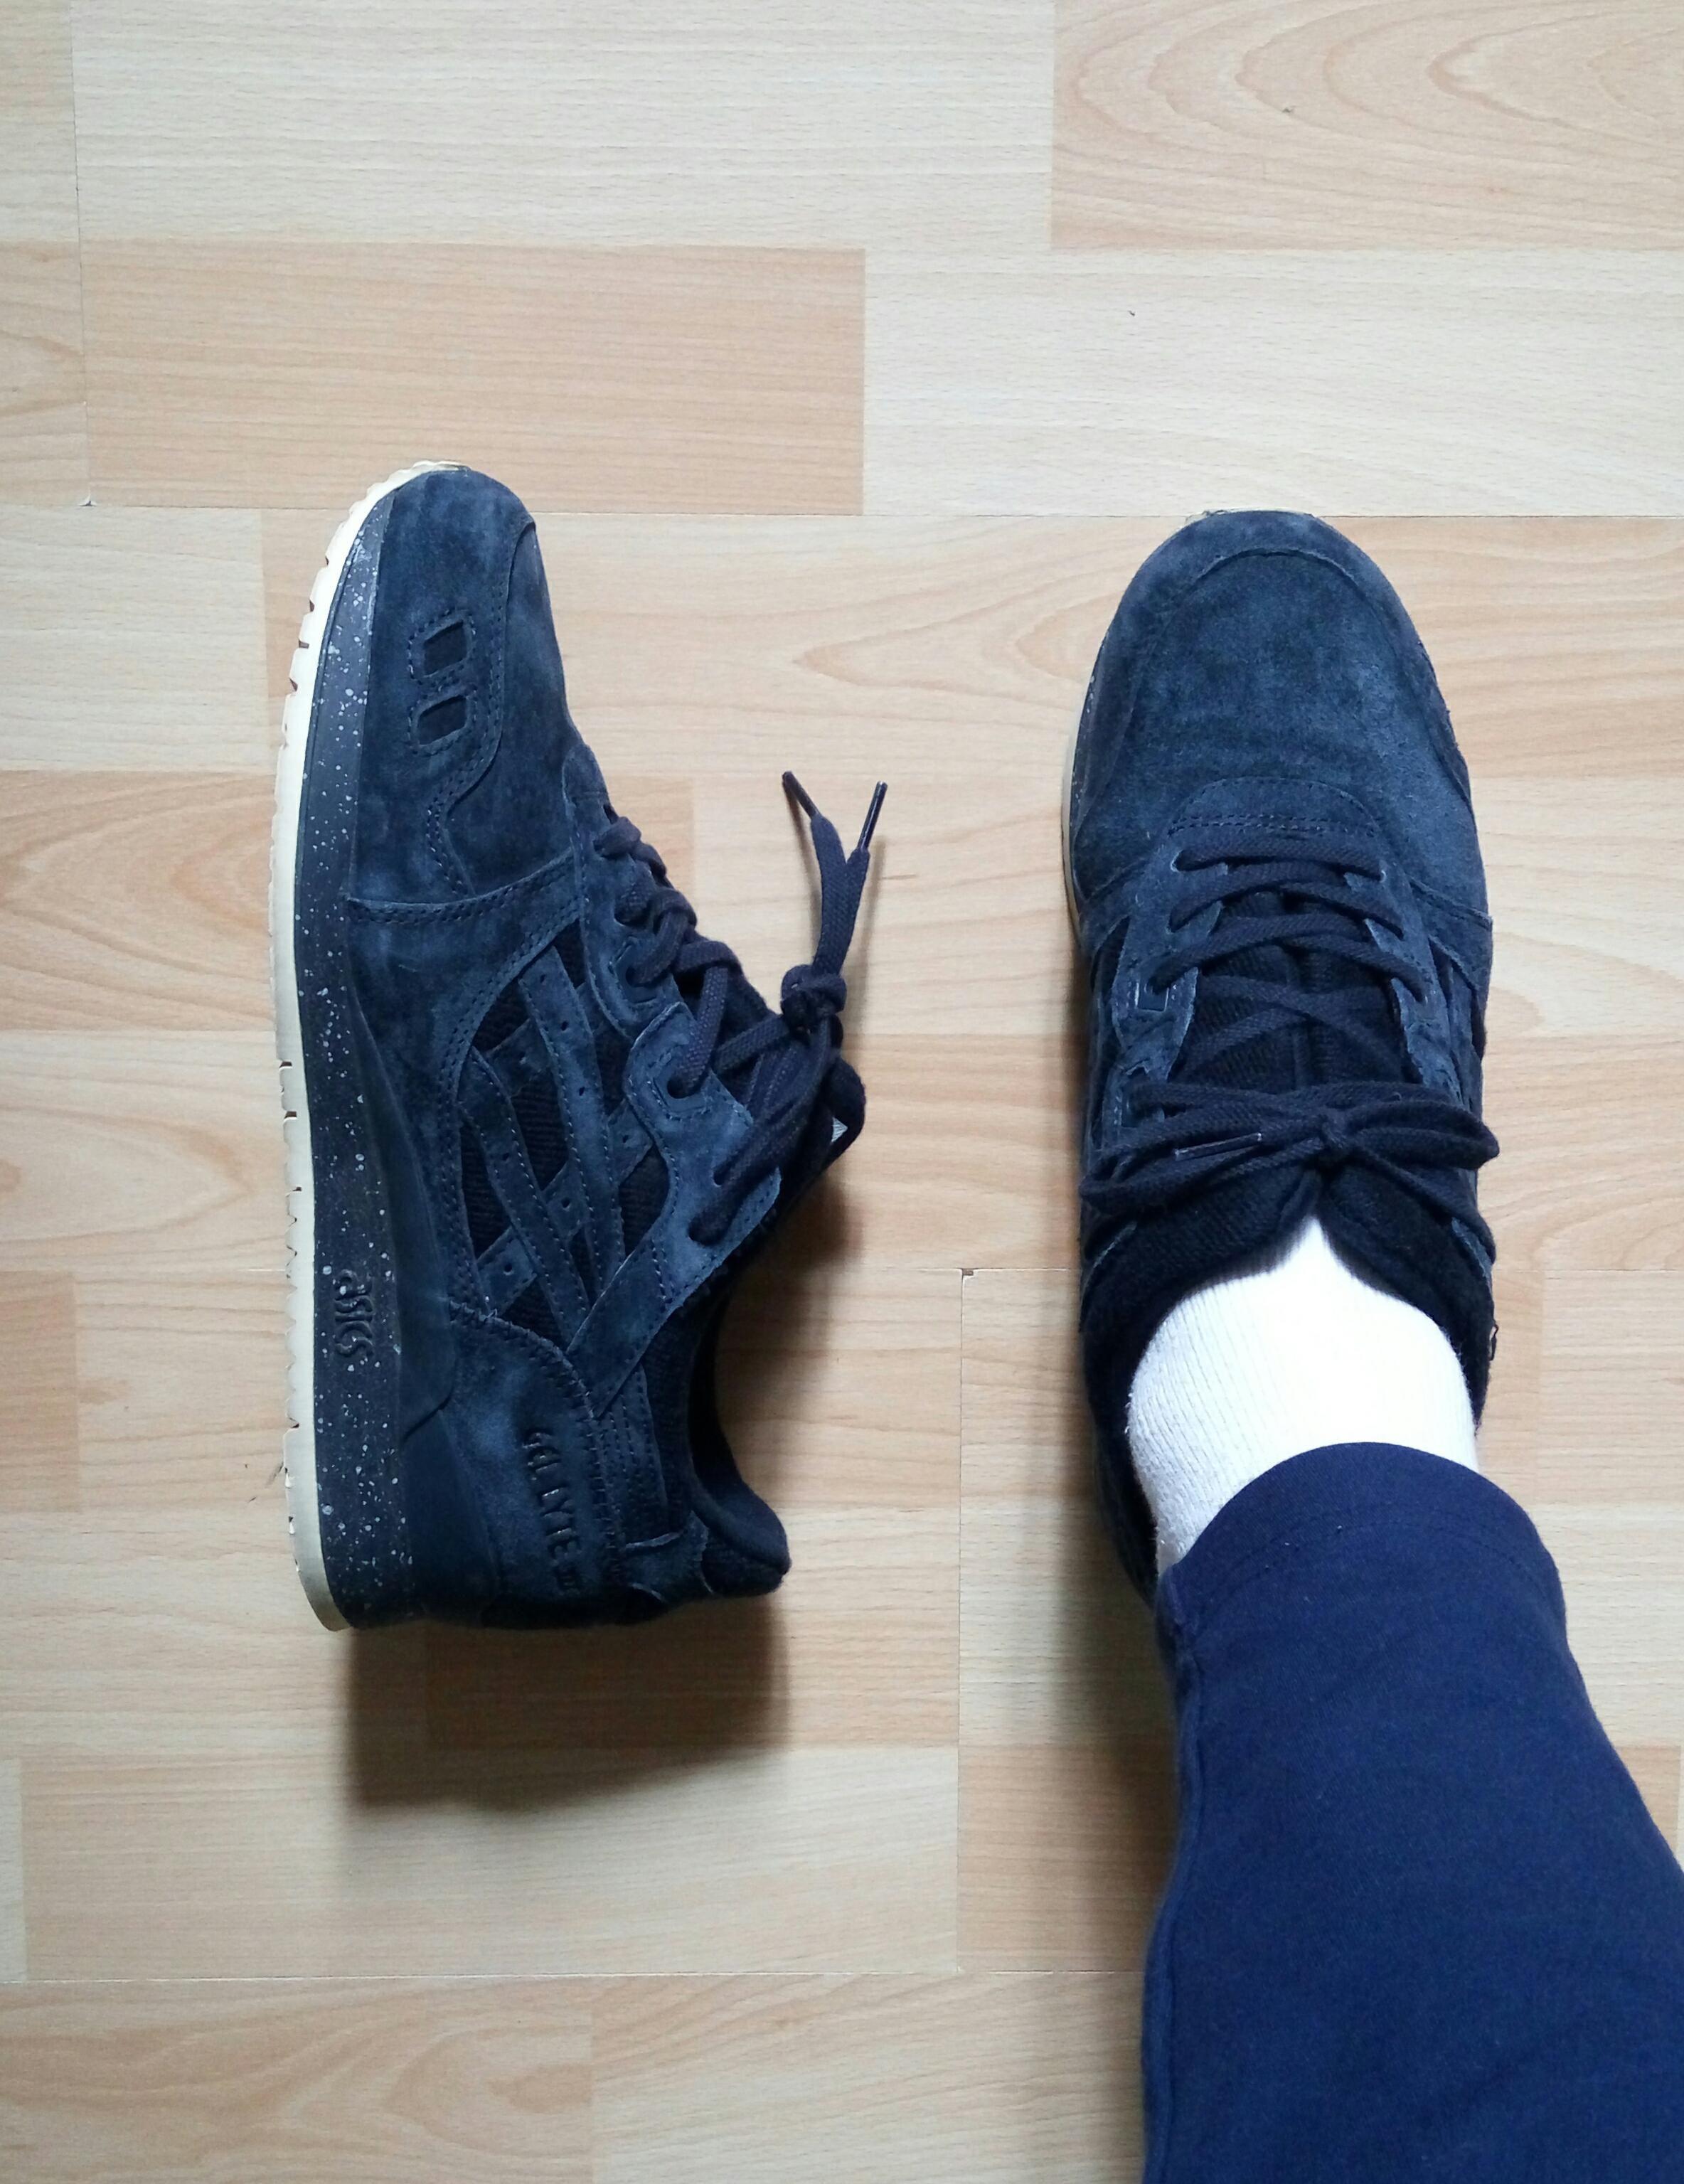 6edf02285e0 WDYWT] Asics Gel Lyte III X Reigning Champ Navy   Nike Sneakers ...